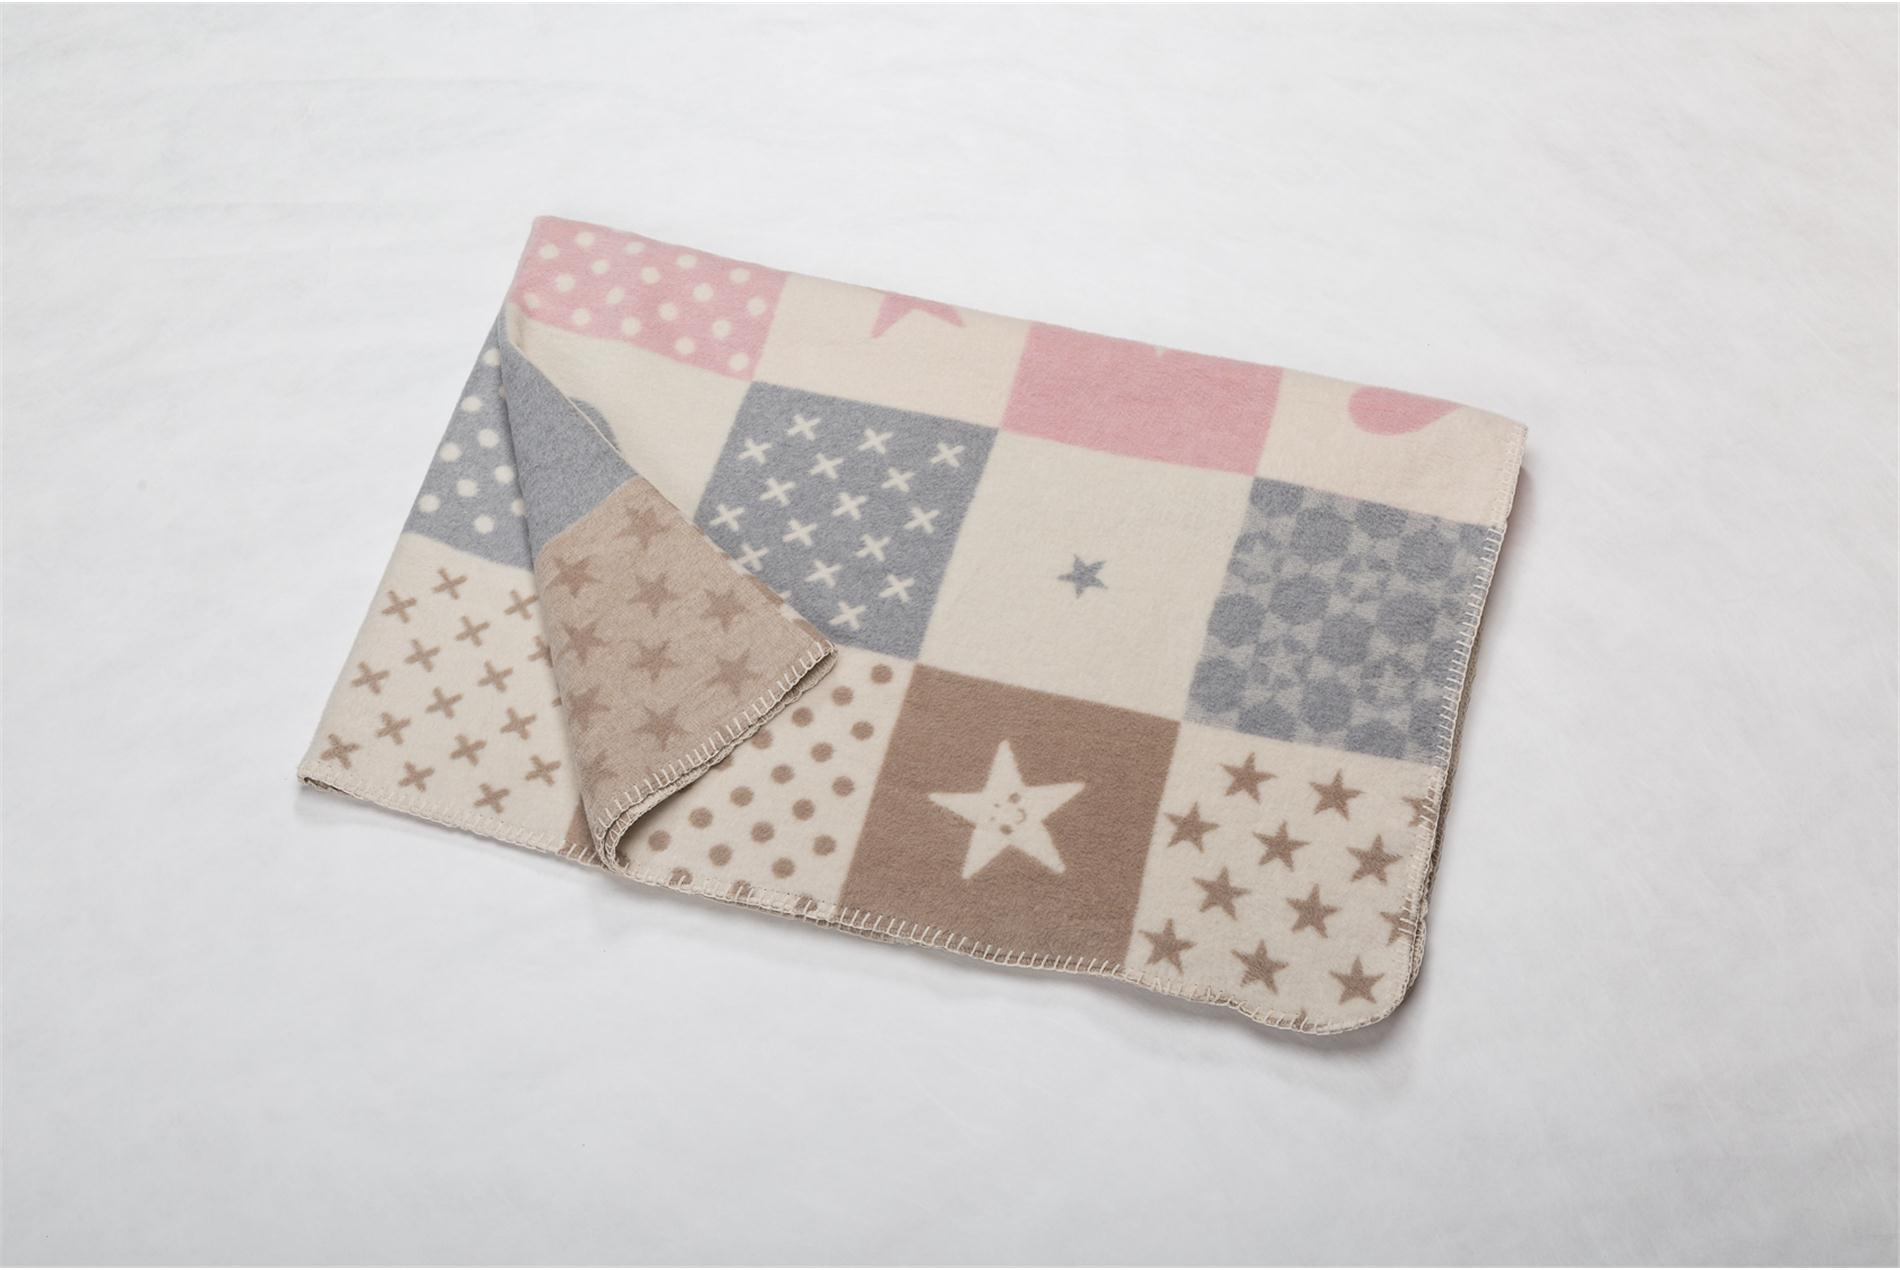 DAVID FUSSENEGGER Decke für Kinder, Quadrate versch. gemustert beige/grau/rosa, 100 x 150 cm